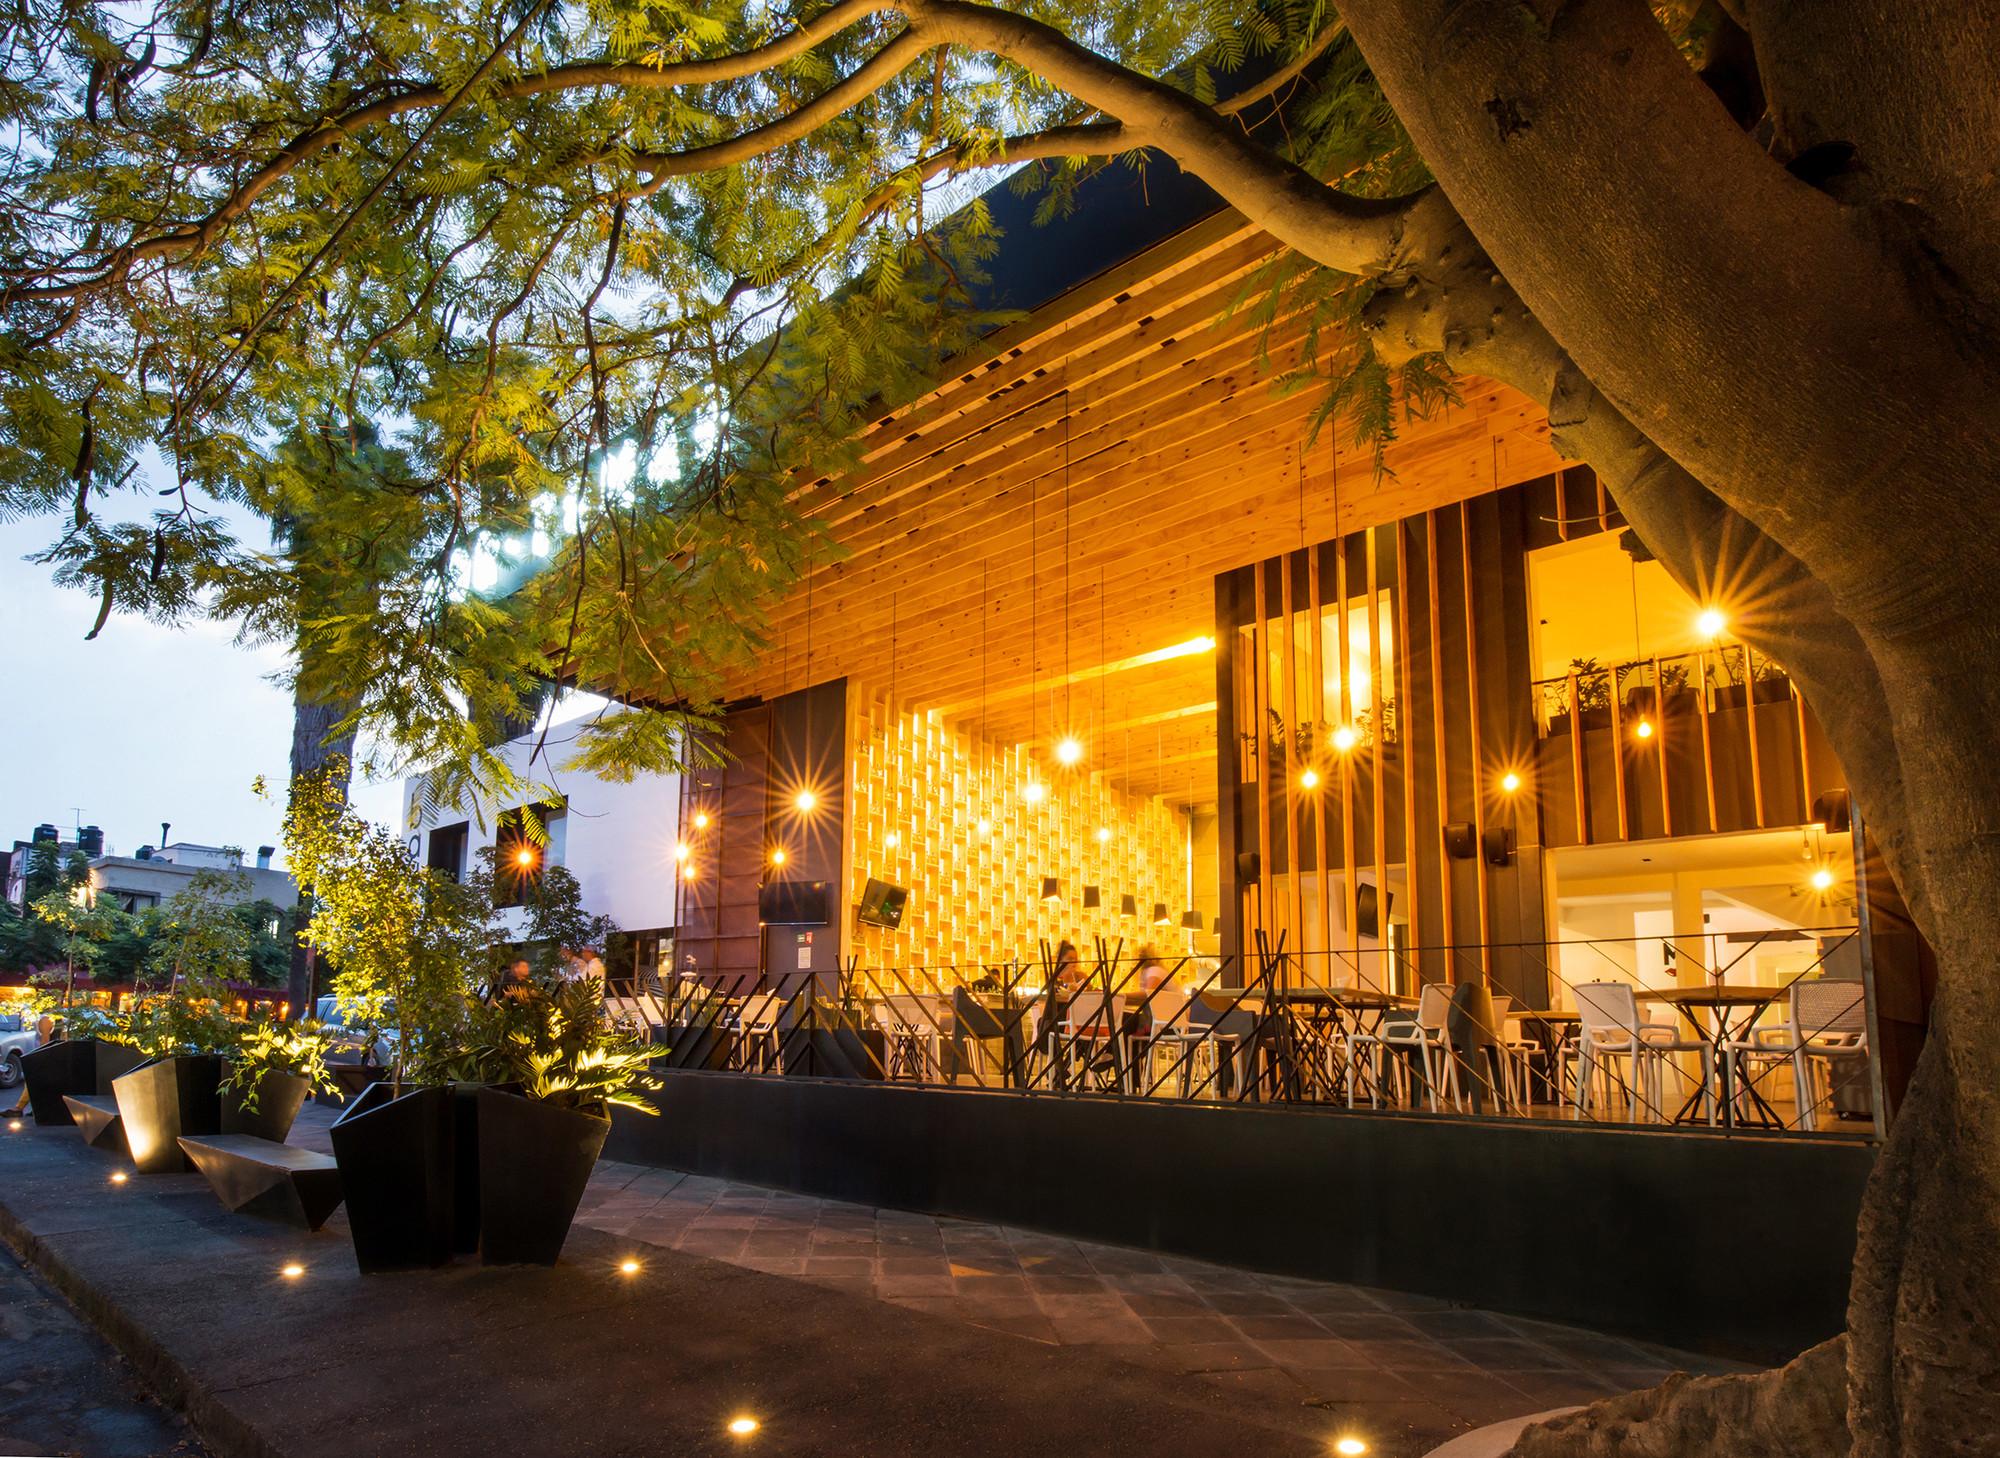 Galer a de bar lc eklemes rivial arquitectura jaa for Arquitectura arquitectura